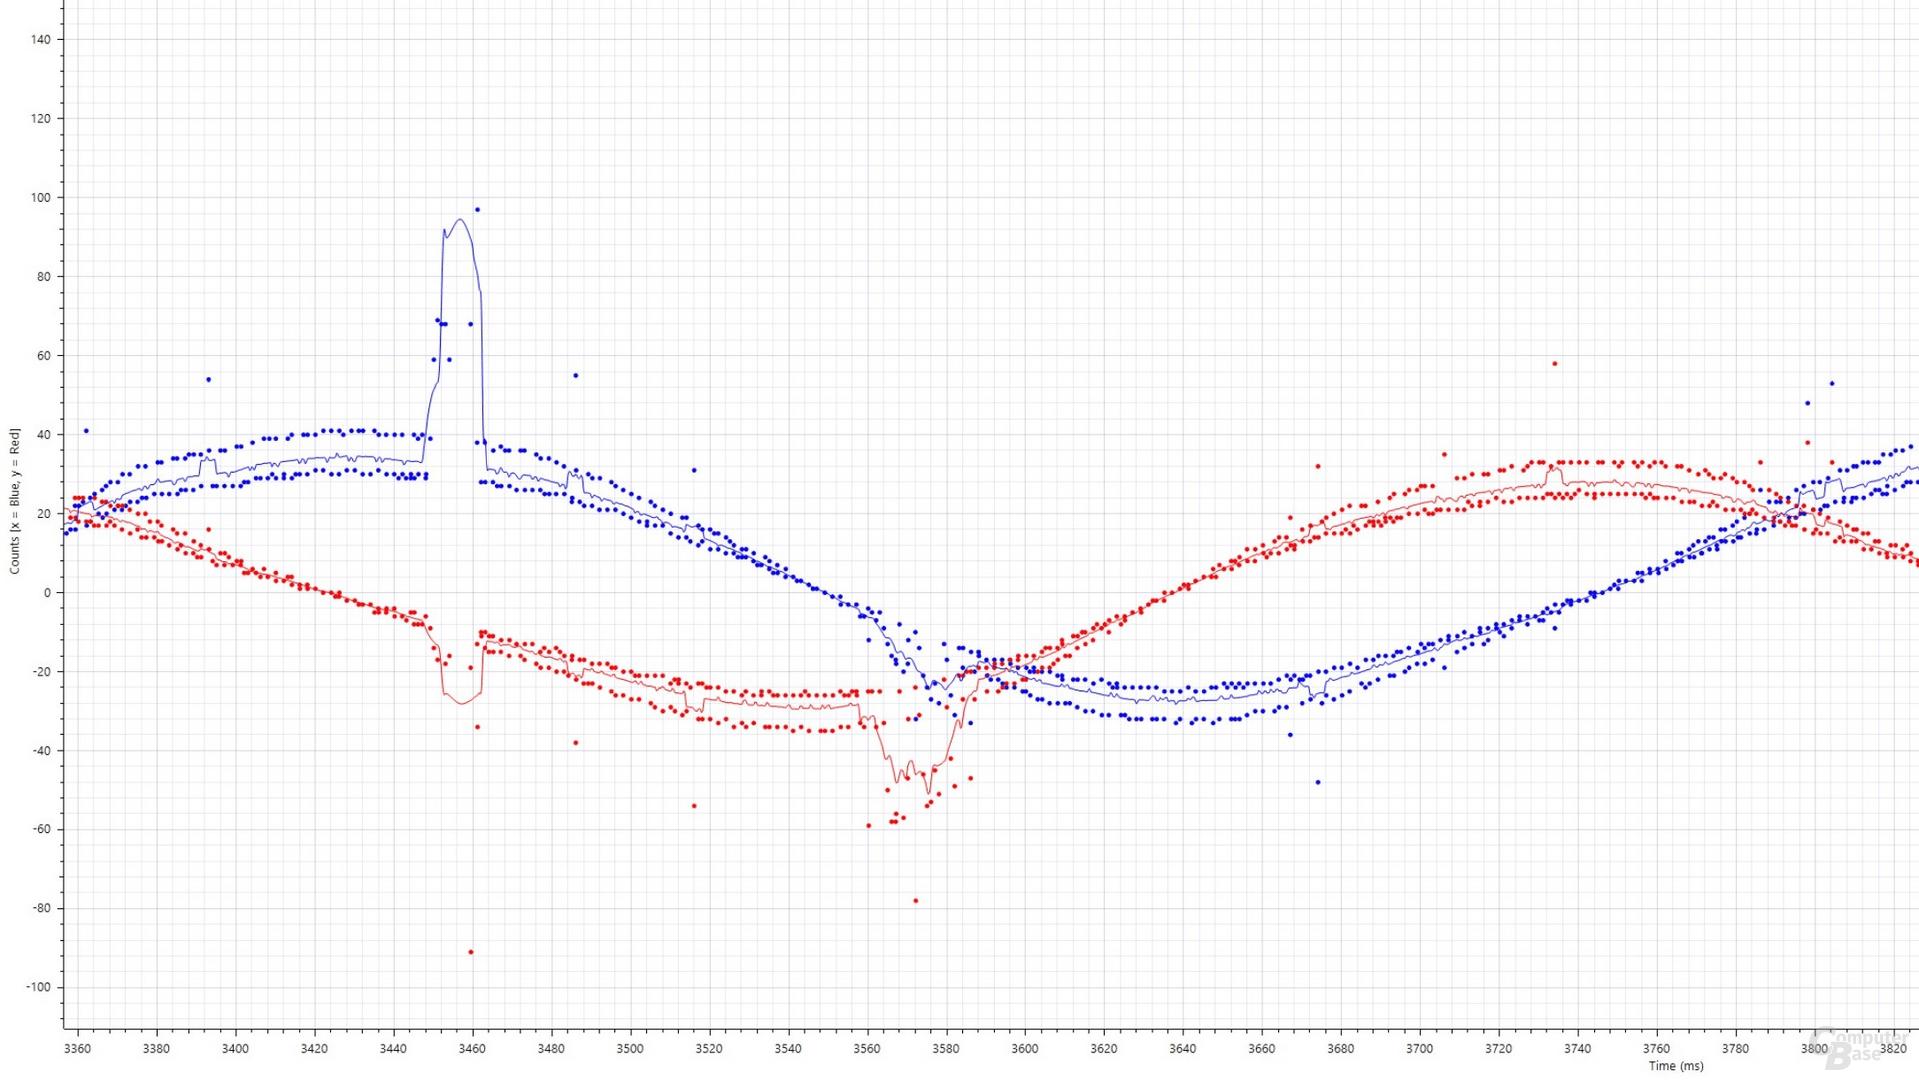 Blau: xCounts(ms), Rot: yCounts(ms); Corsair Dark Core RGB Pro SE (PixArt PAW-3392, 1.000 cpi, 2.000 Hertz, Stoffmauspad)